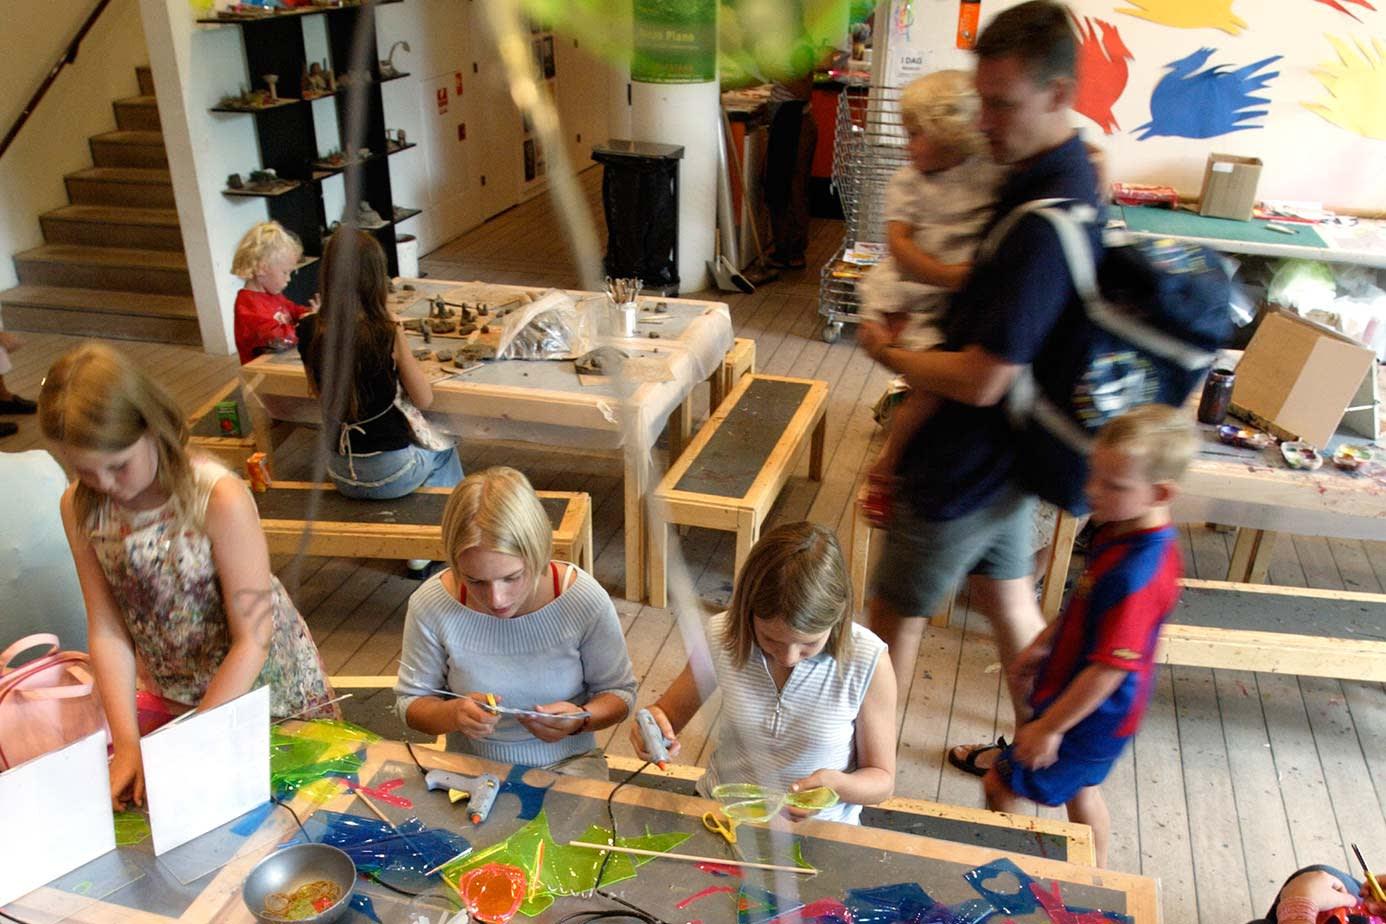 louisiana kids crafts Copenhagen